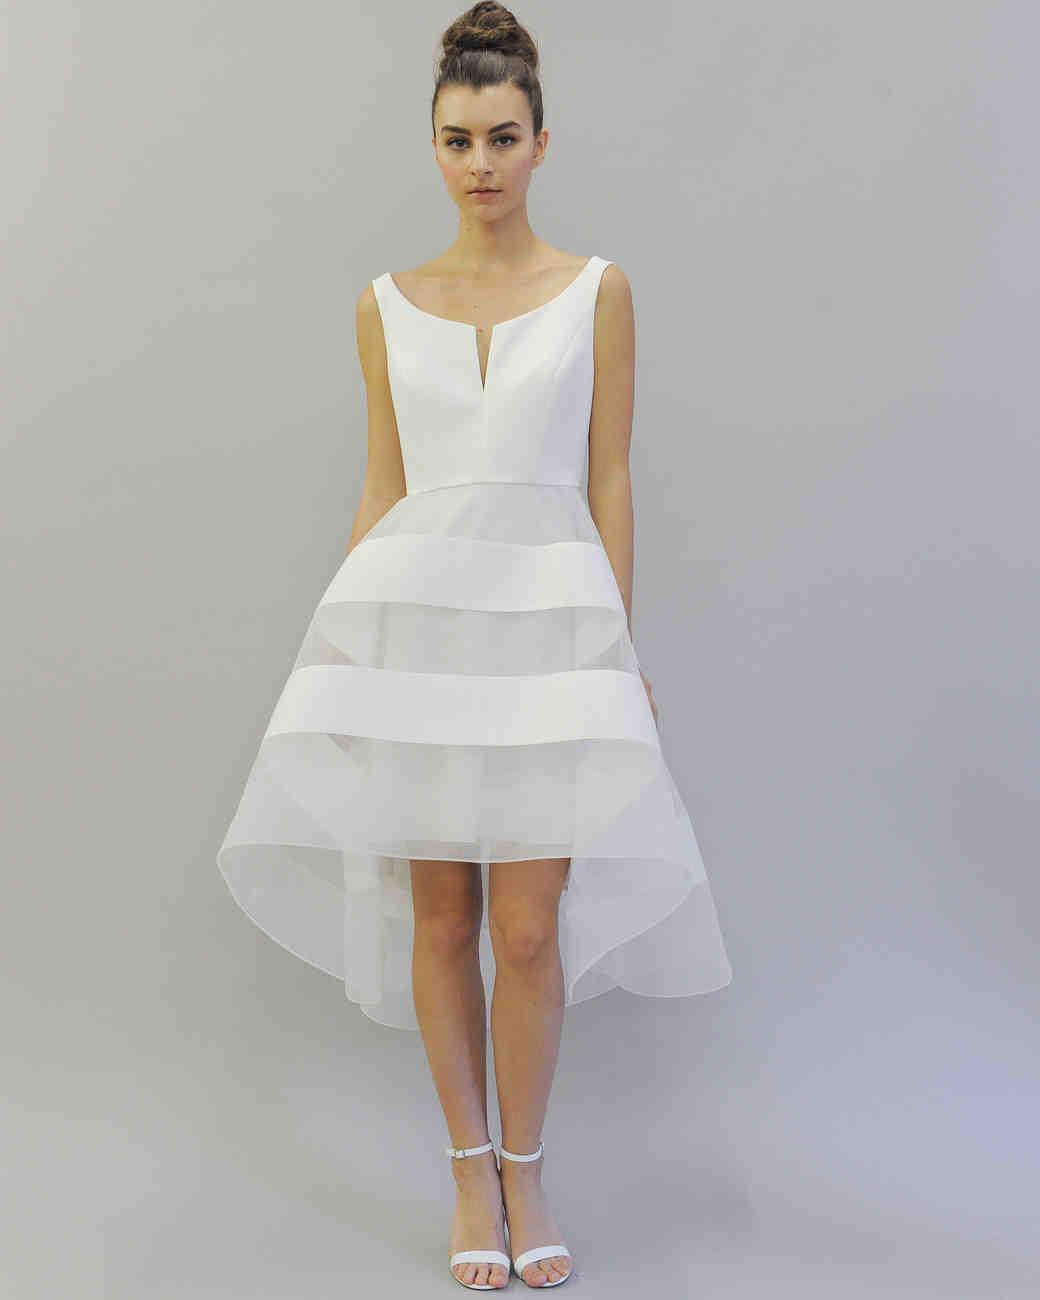 Wedding Dresses 2017: Austin Scarlett Fall 2017 Wedding Dress Collection